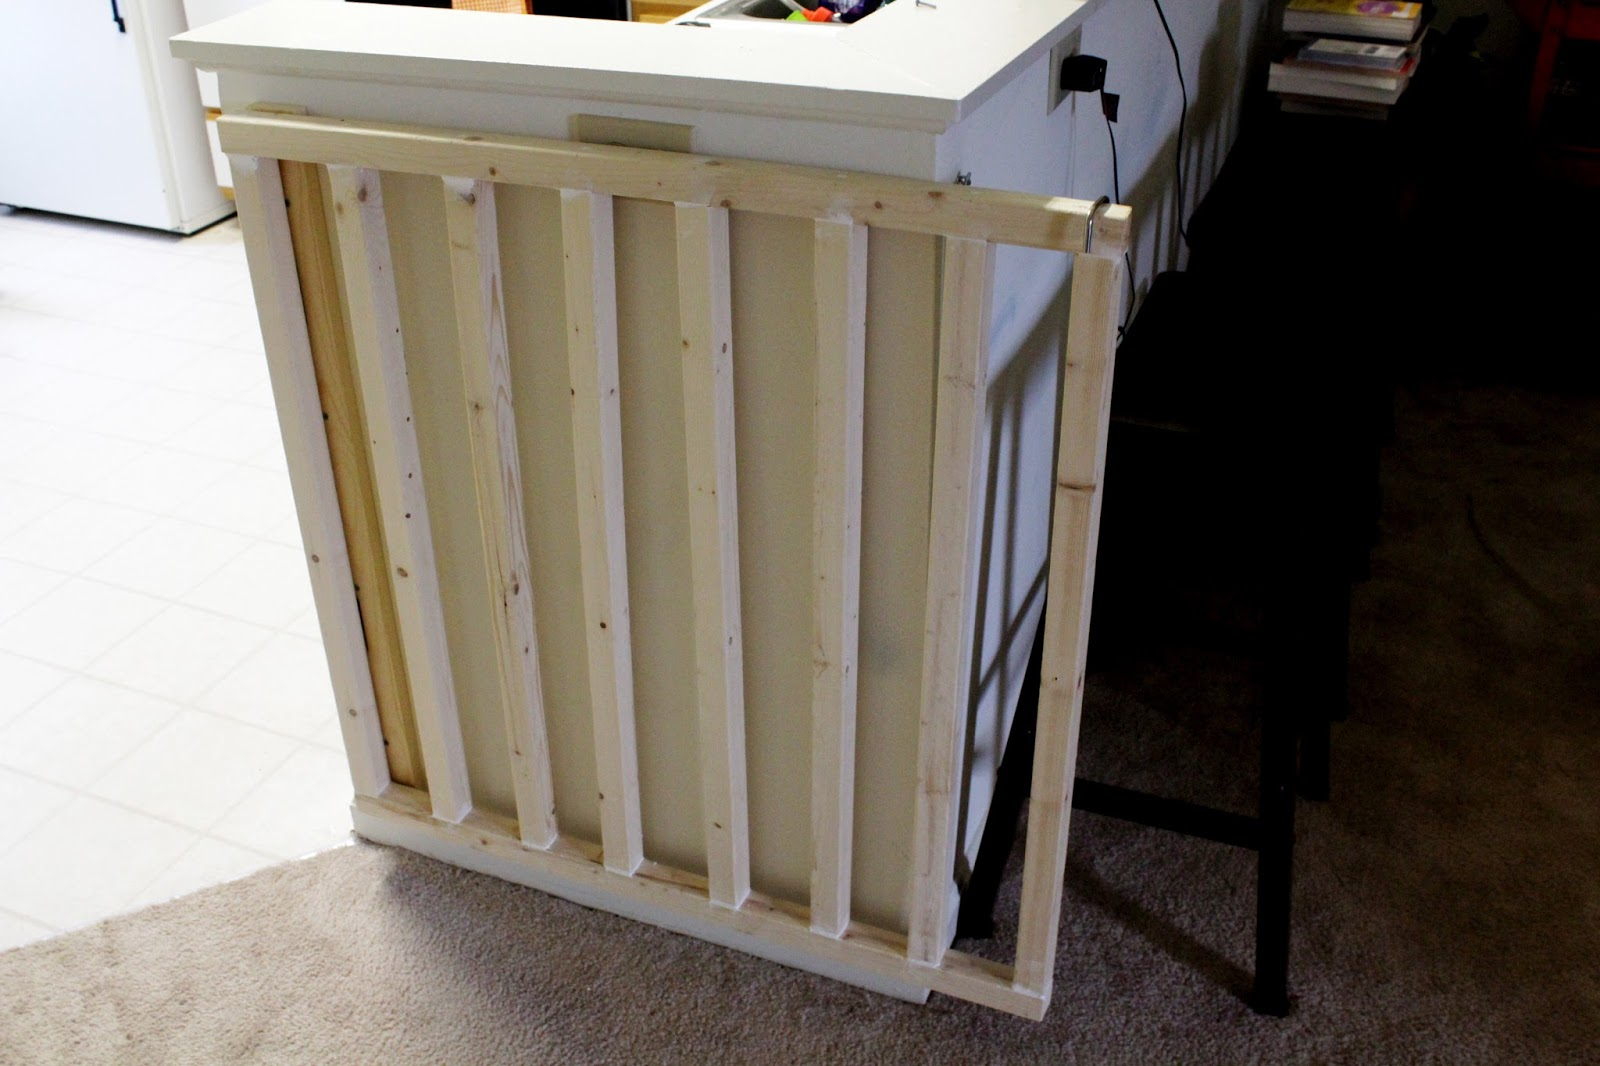 DIY | Angled Dog Gate - The Affourtable Life